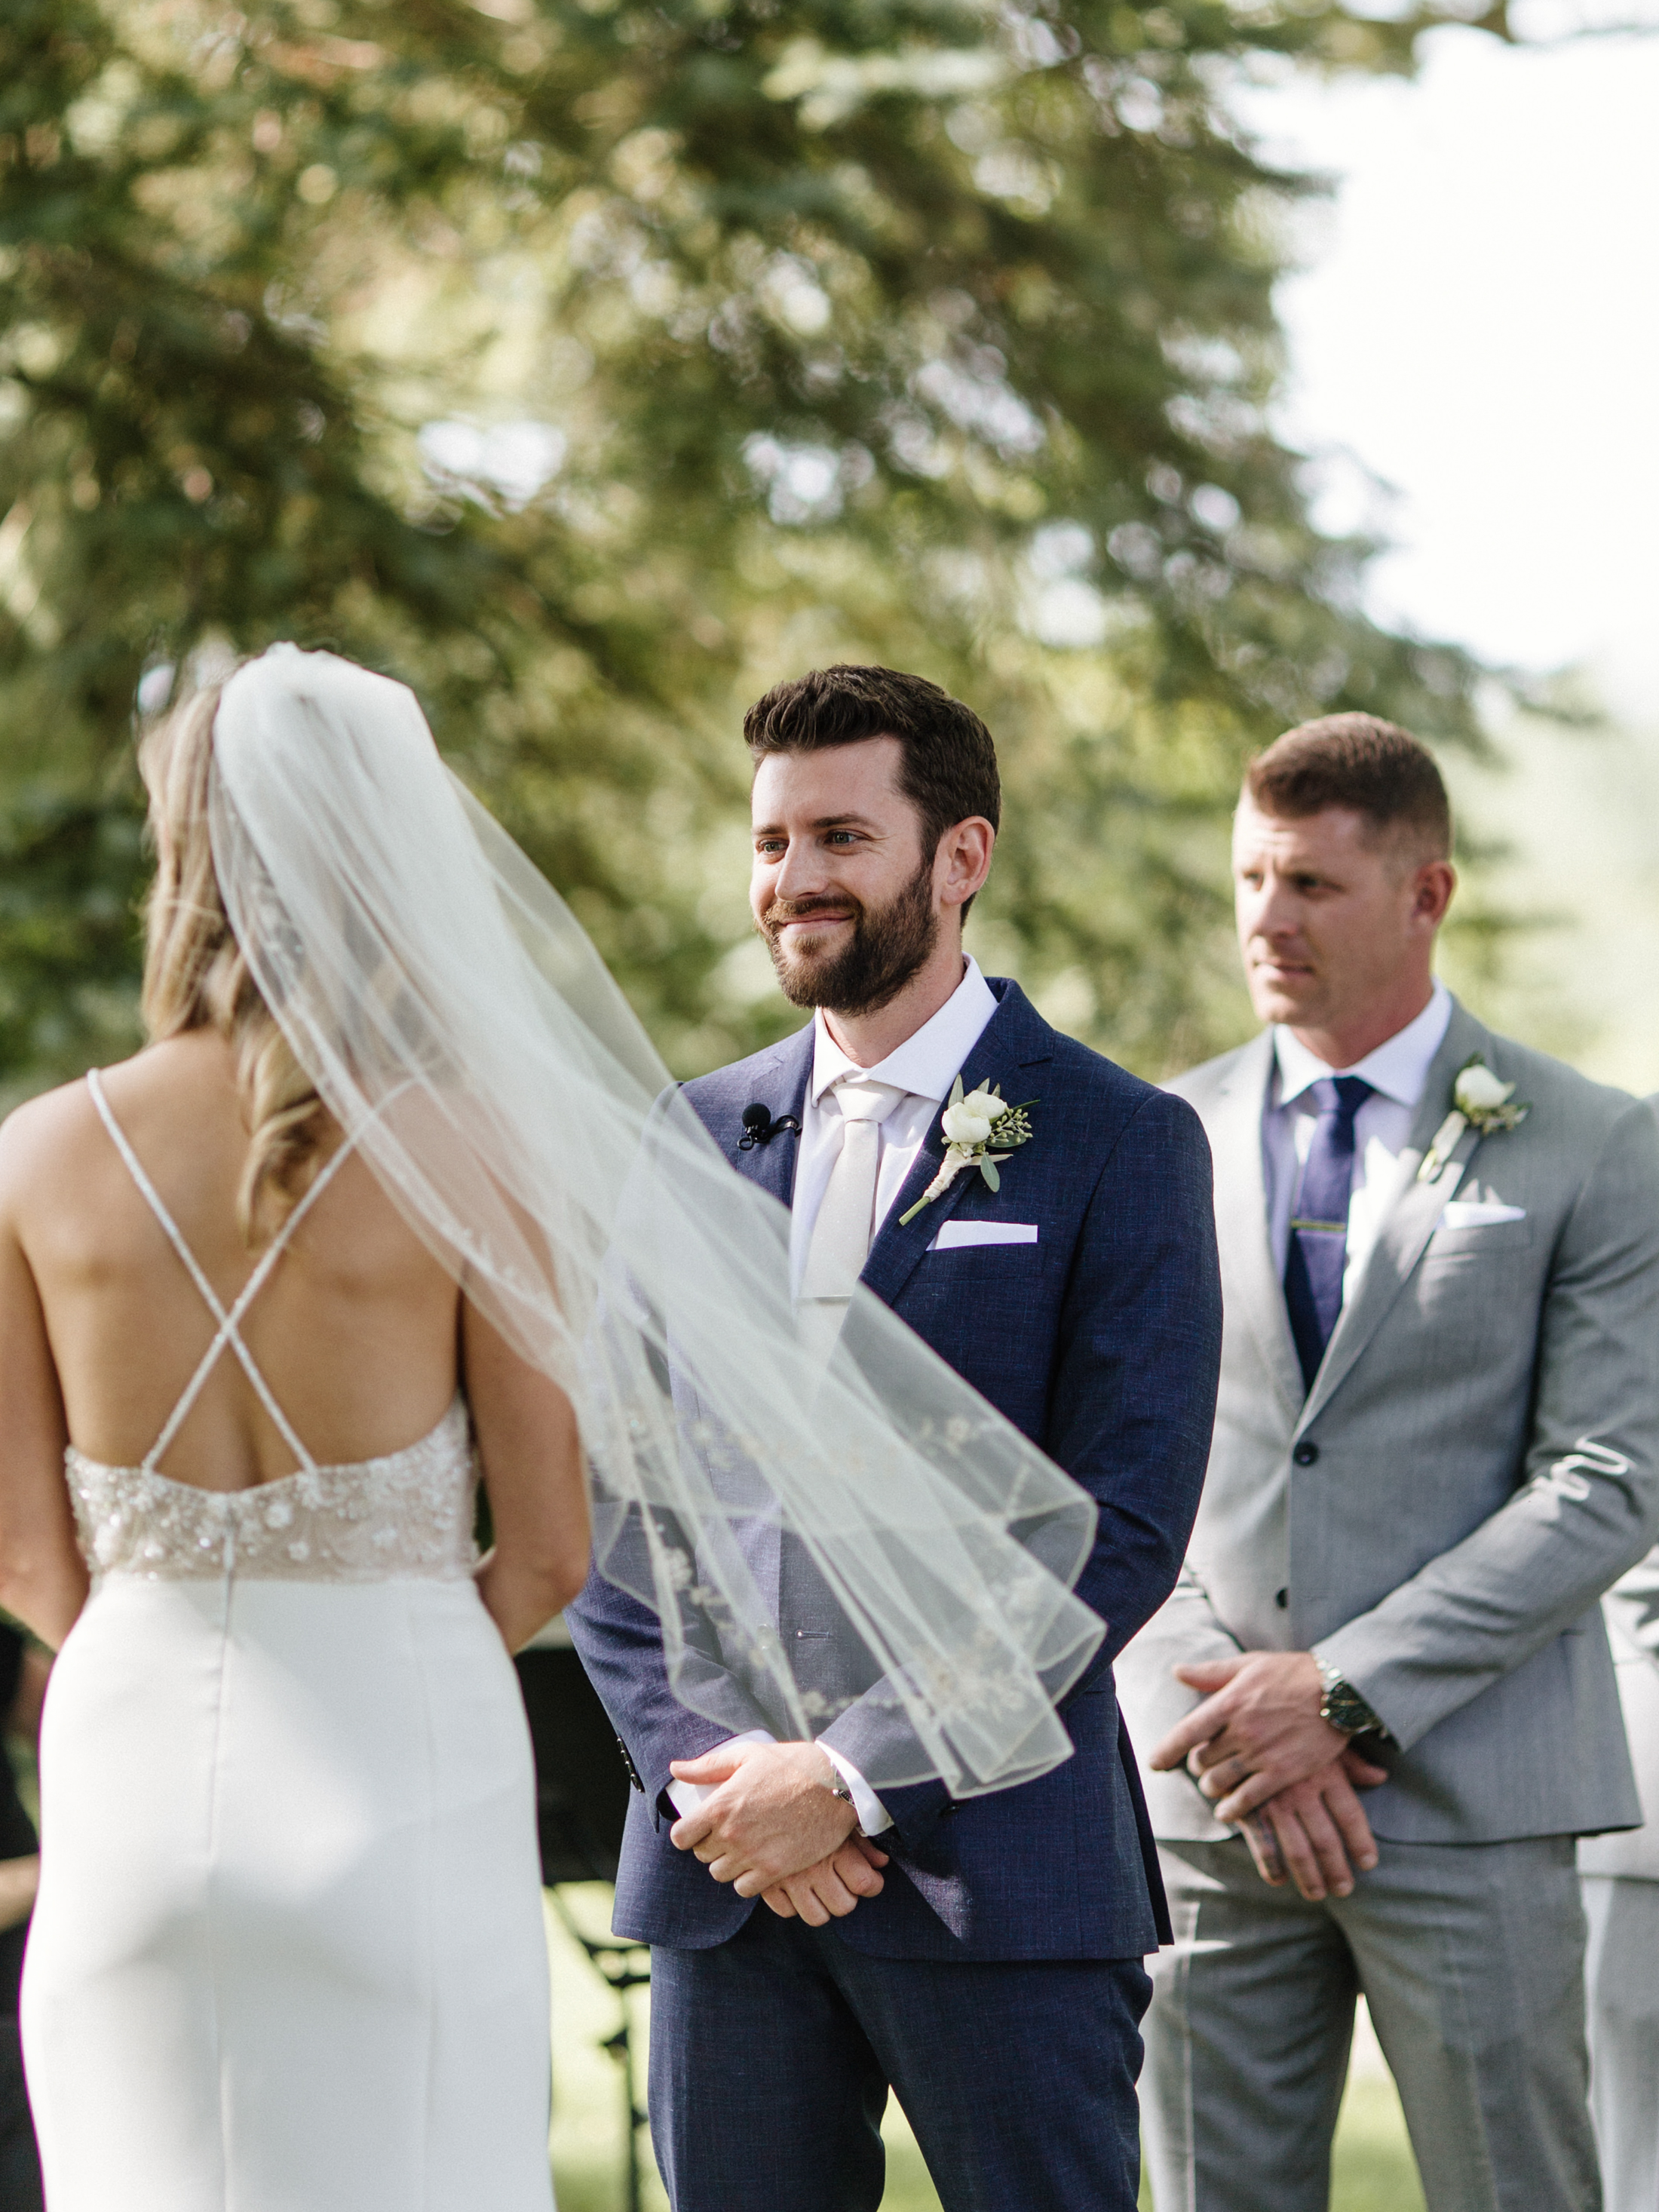 03-Smith-Wedding-Ceremony-113.jpg